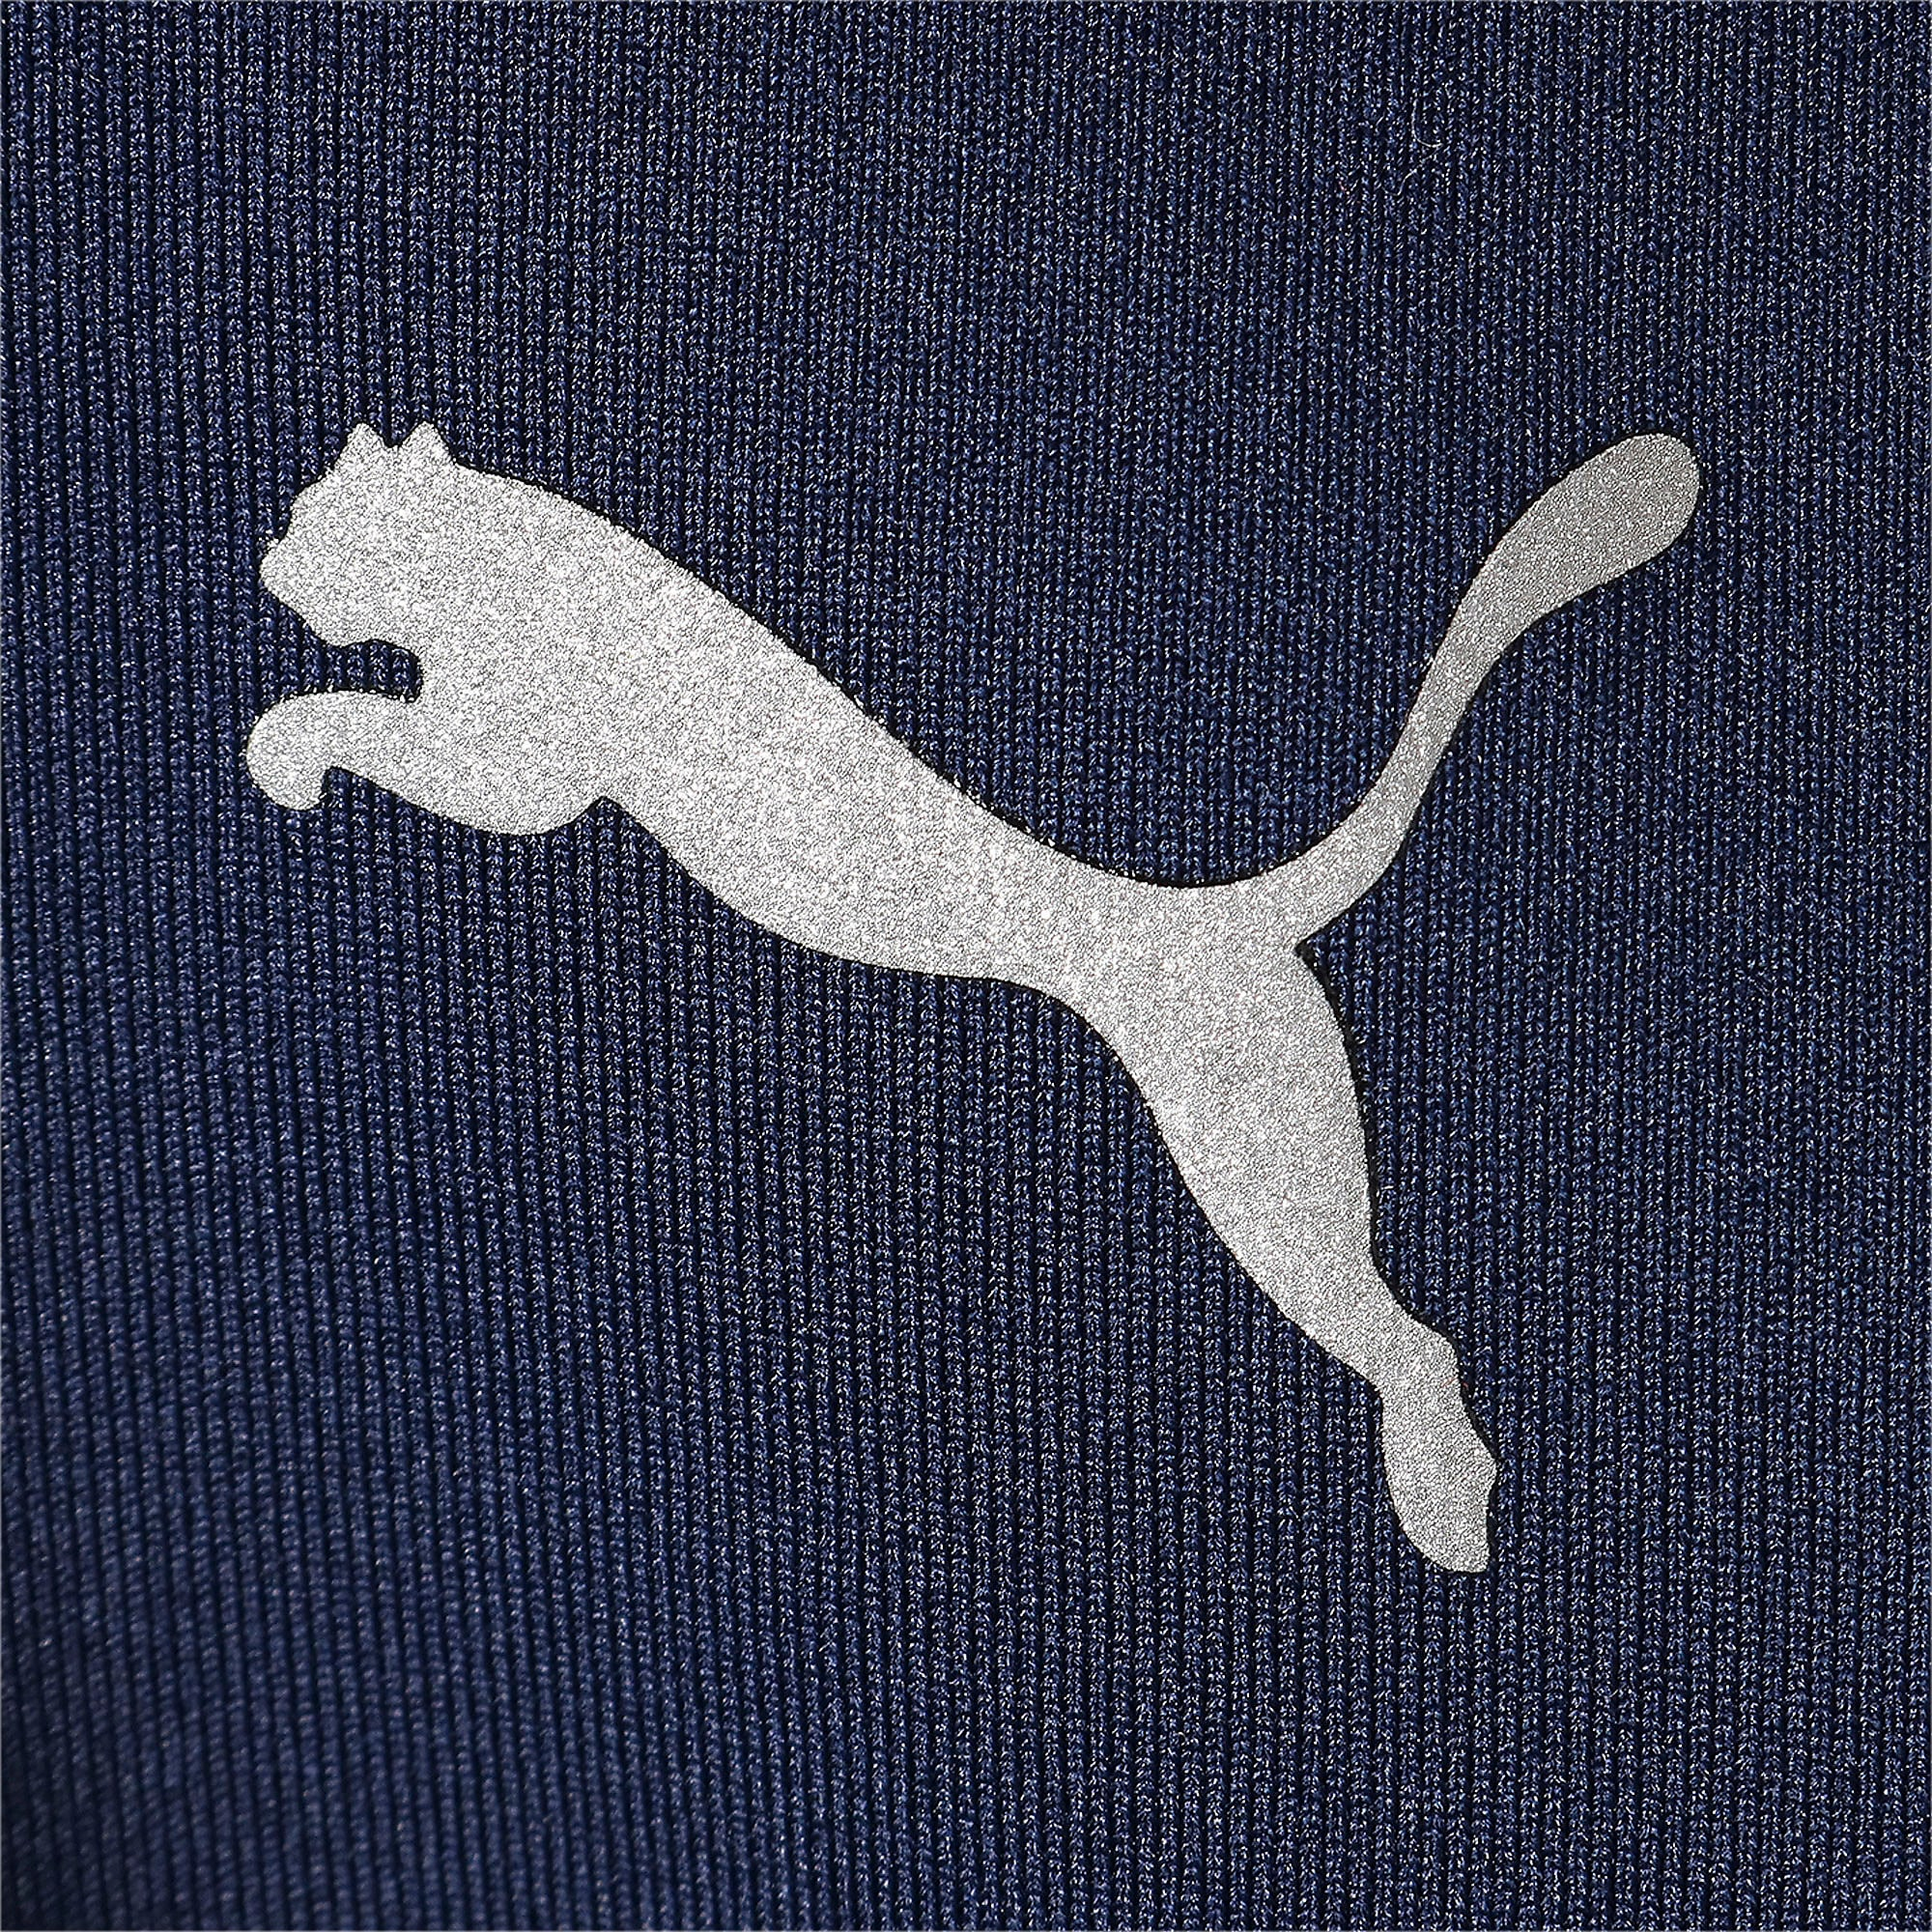 Thumbnail 4 of テック ライト LS ウィメンズ トレーニング Tシャツ 長袖, Peacoat, medium-JPN